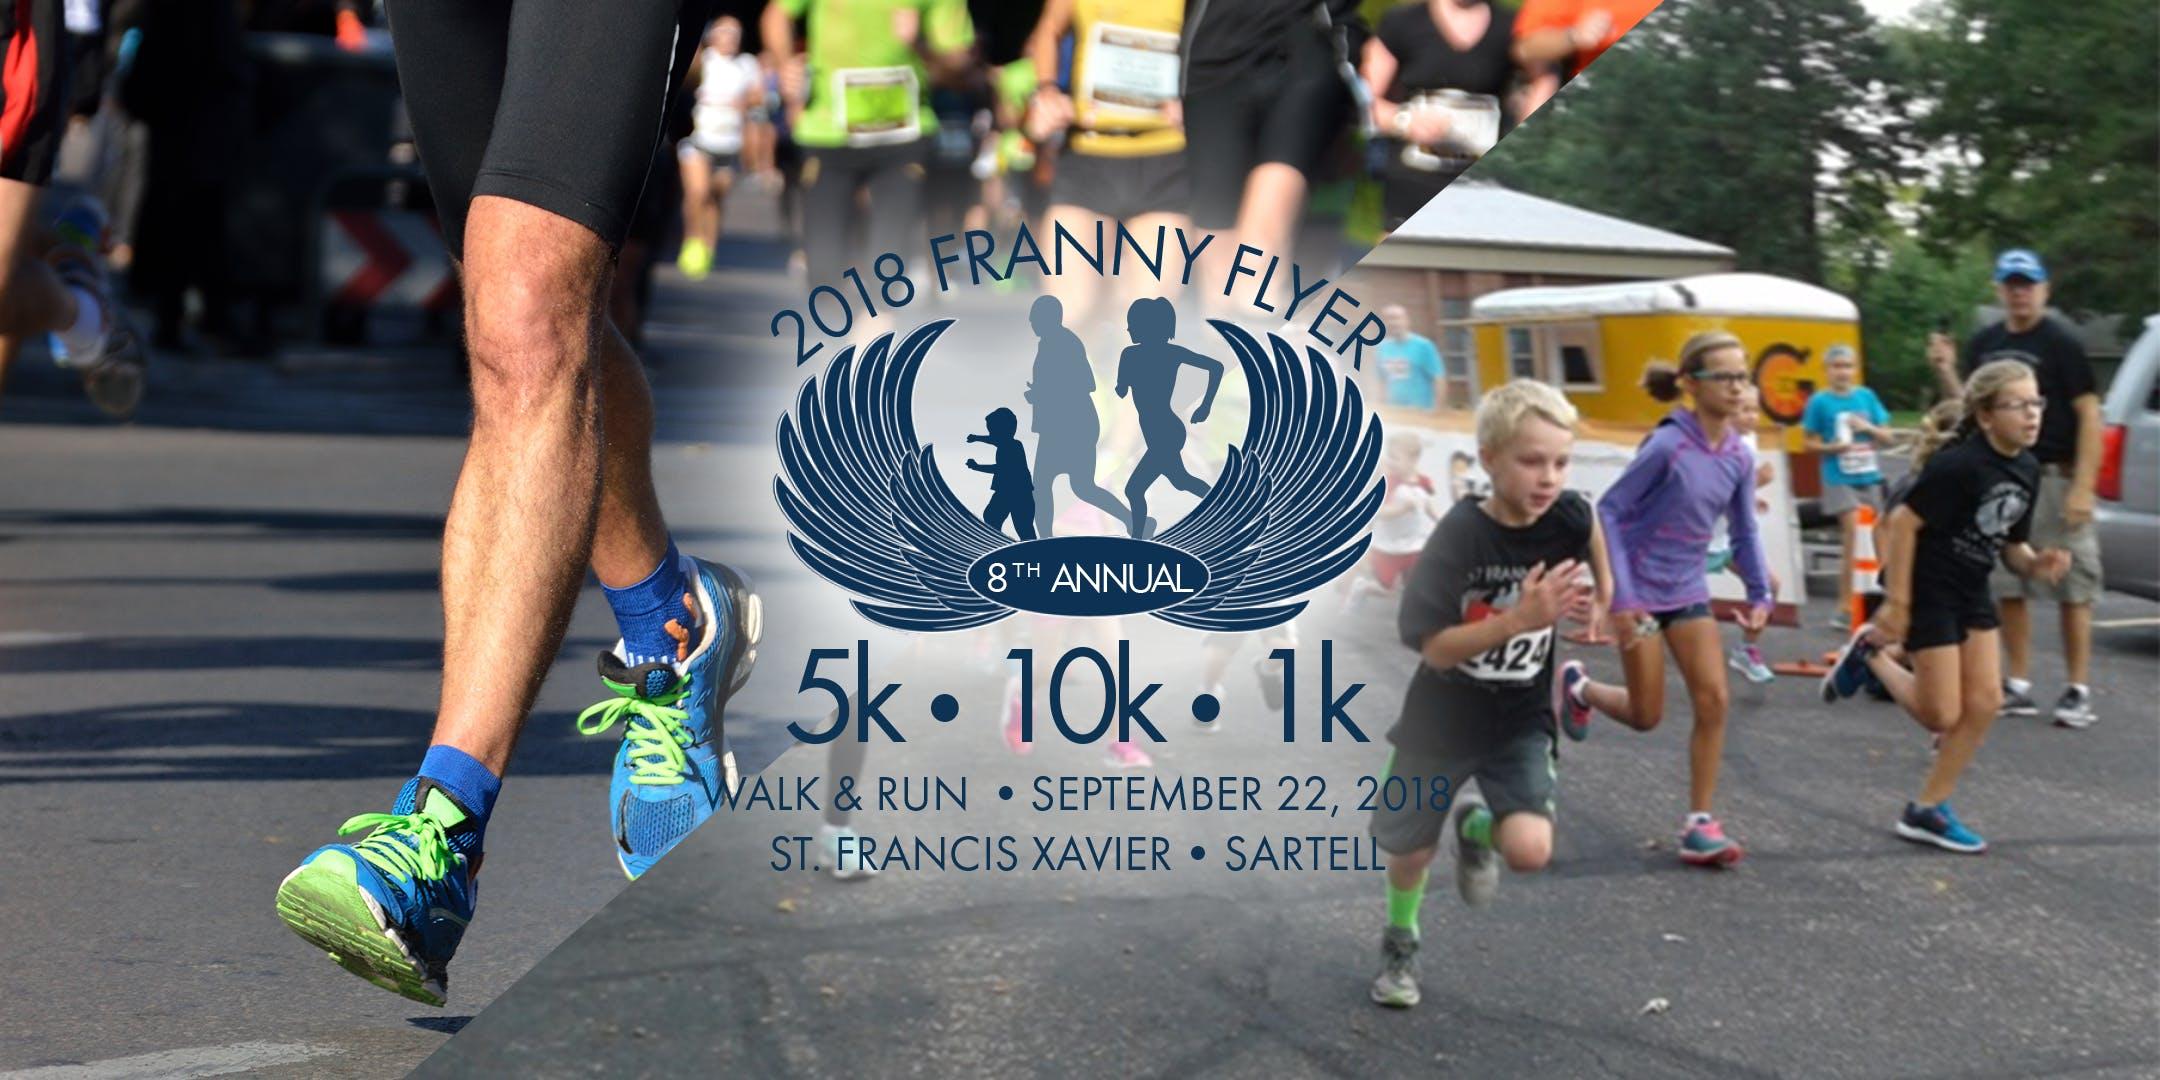 8th Annual St. Francis Franny Flyer 5K, 10K &